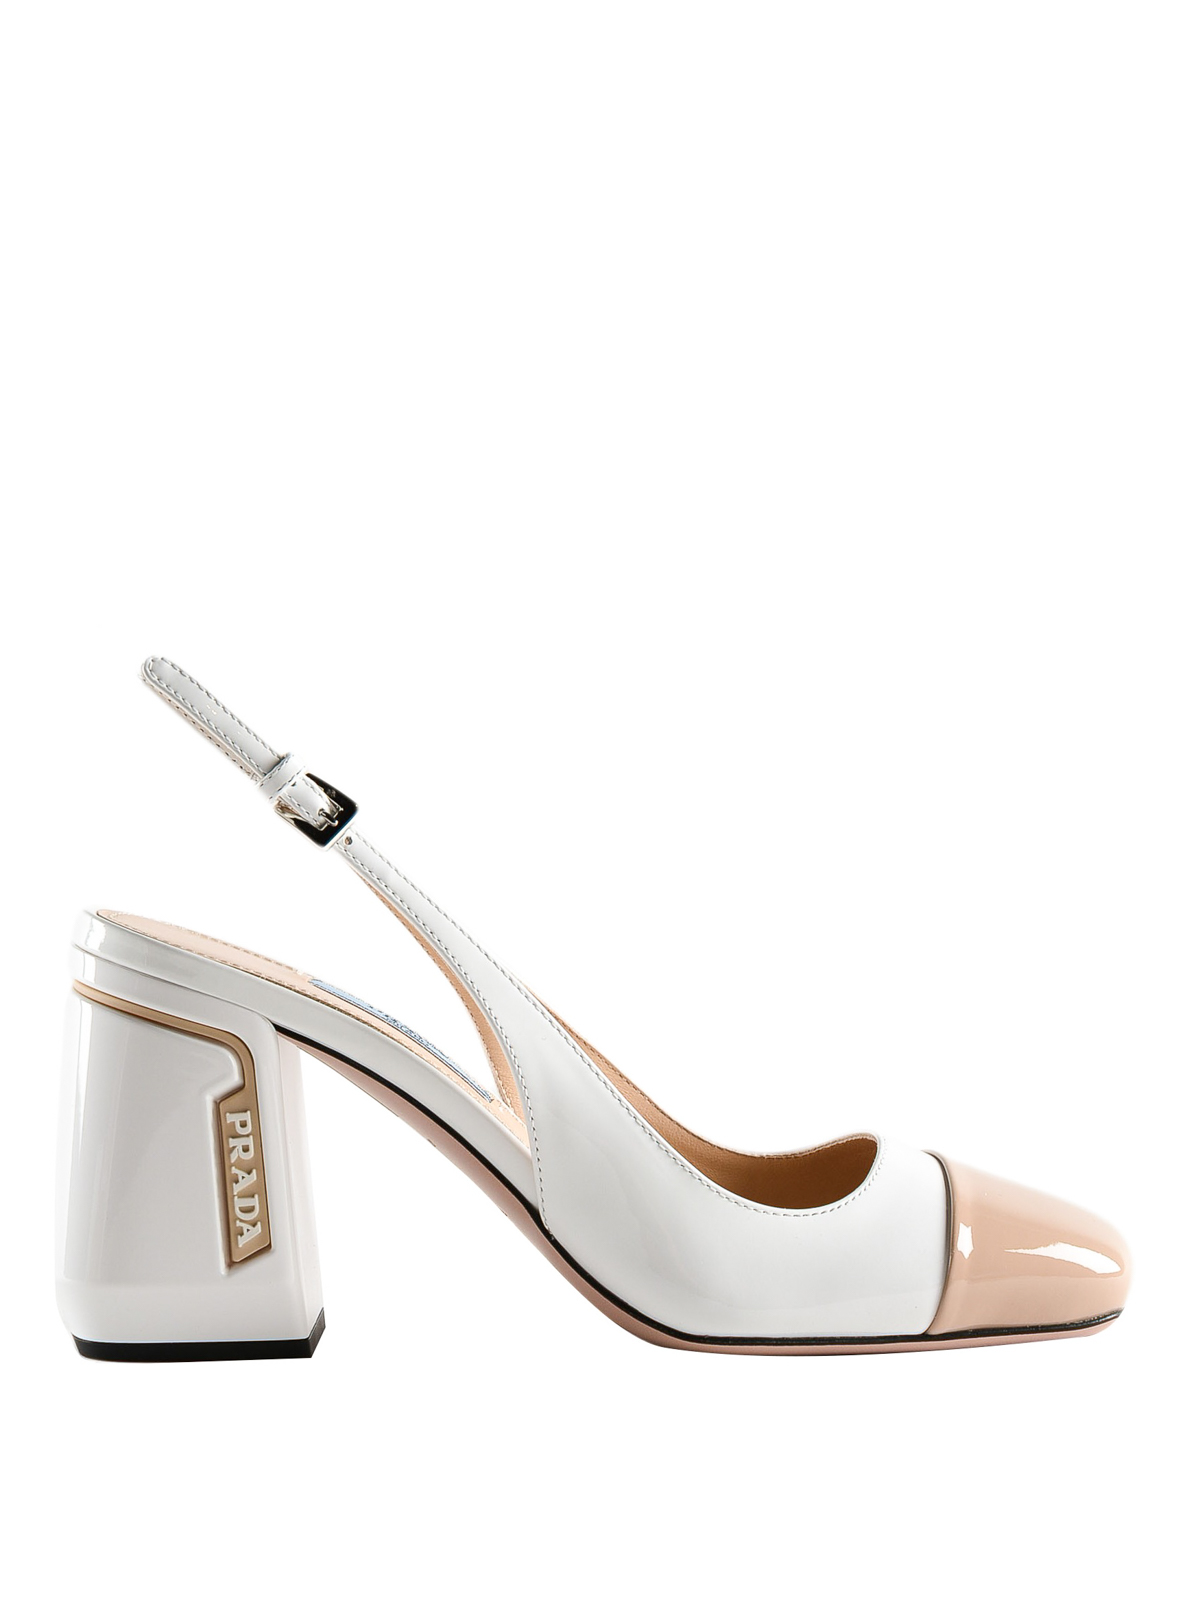 3c43edffda97 Prada - Patent leather two-tone slingback pump - court shoes ...